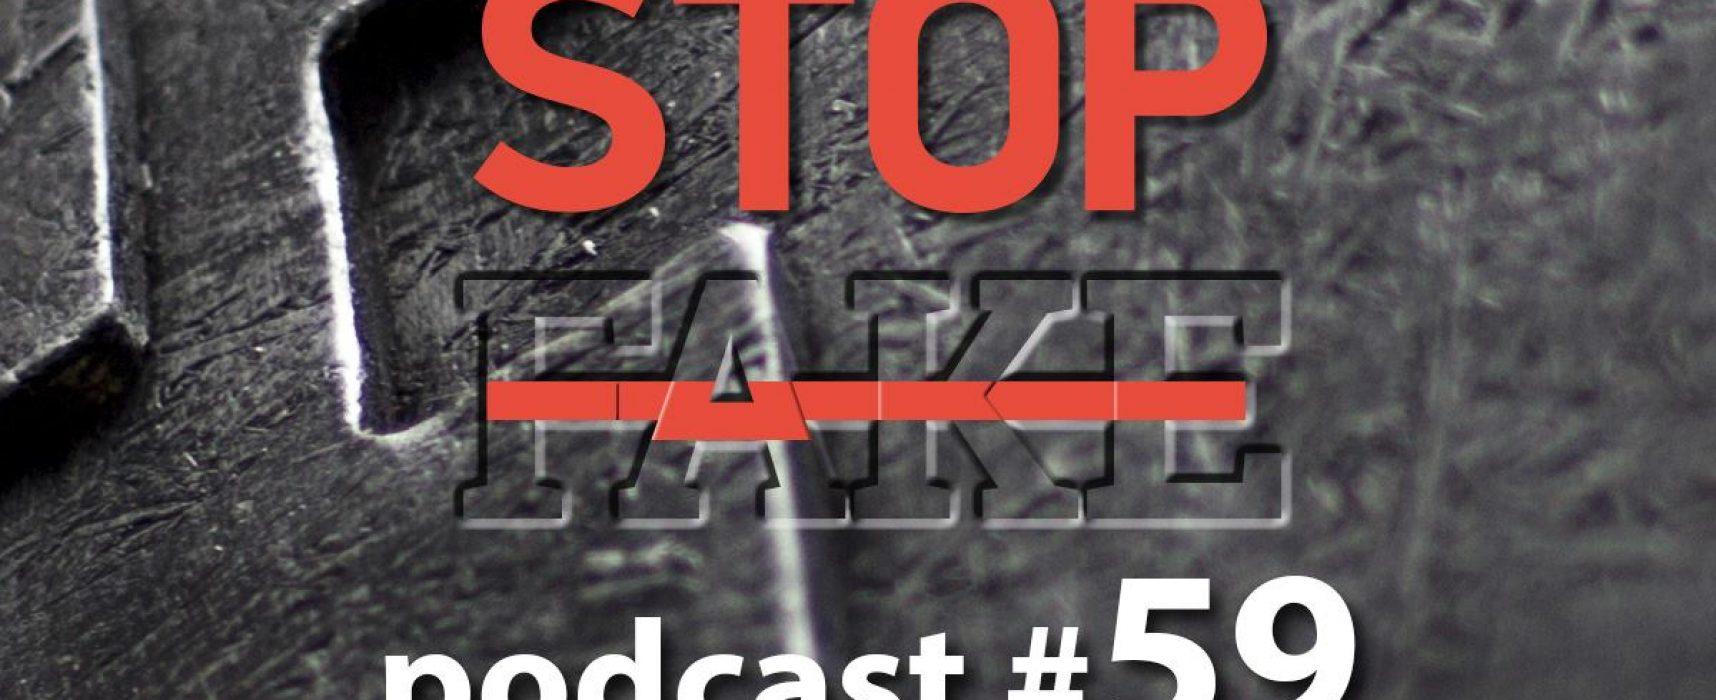 StopFake podcast #59